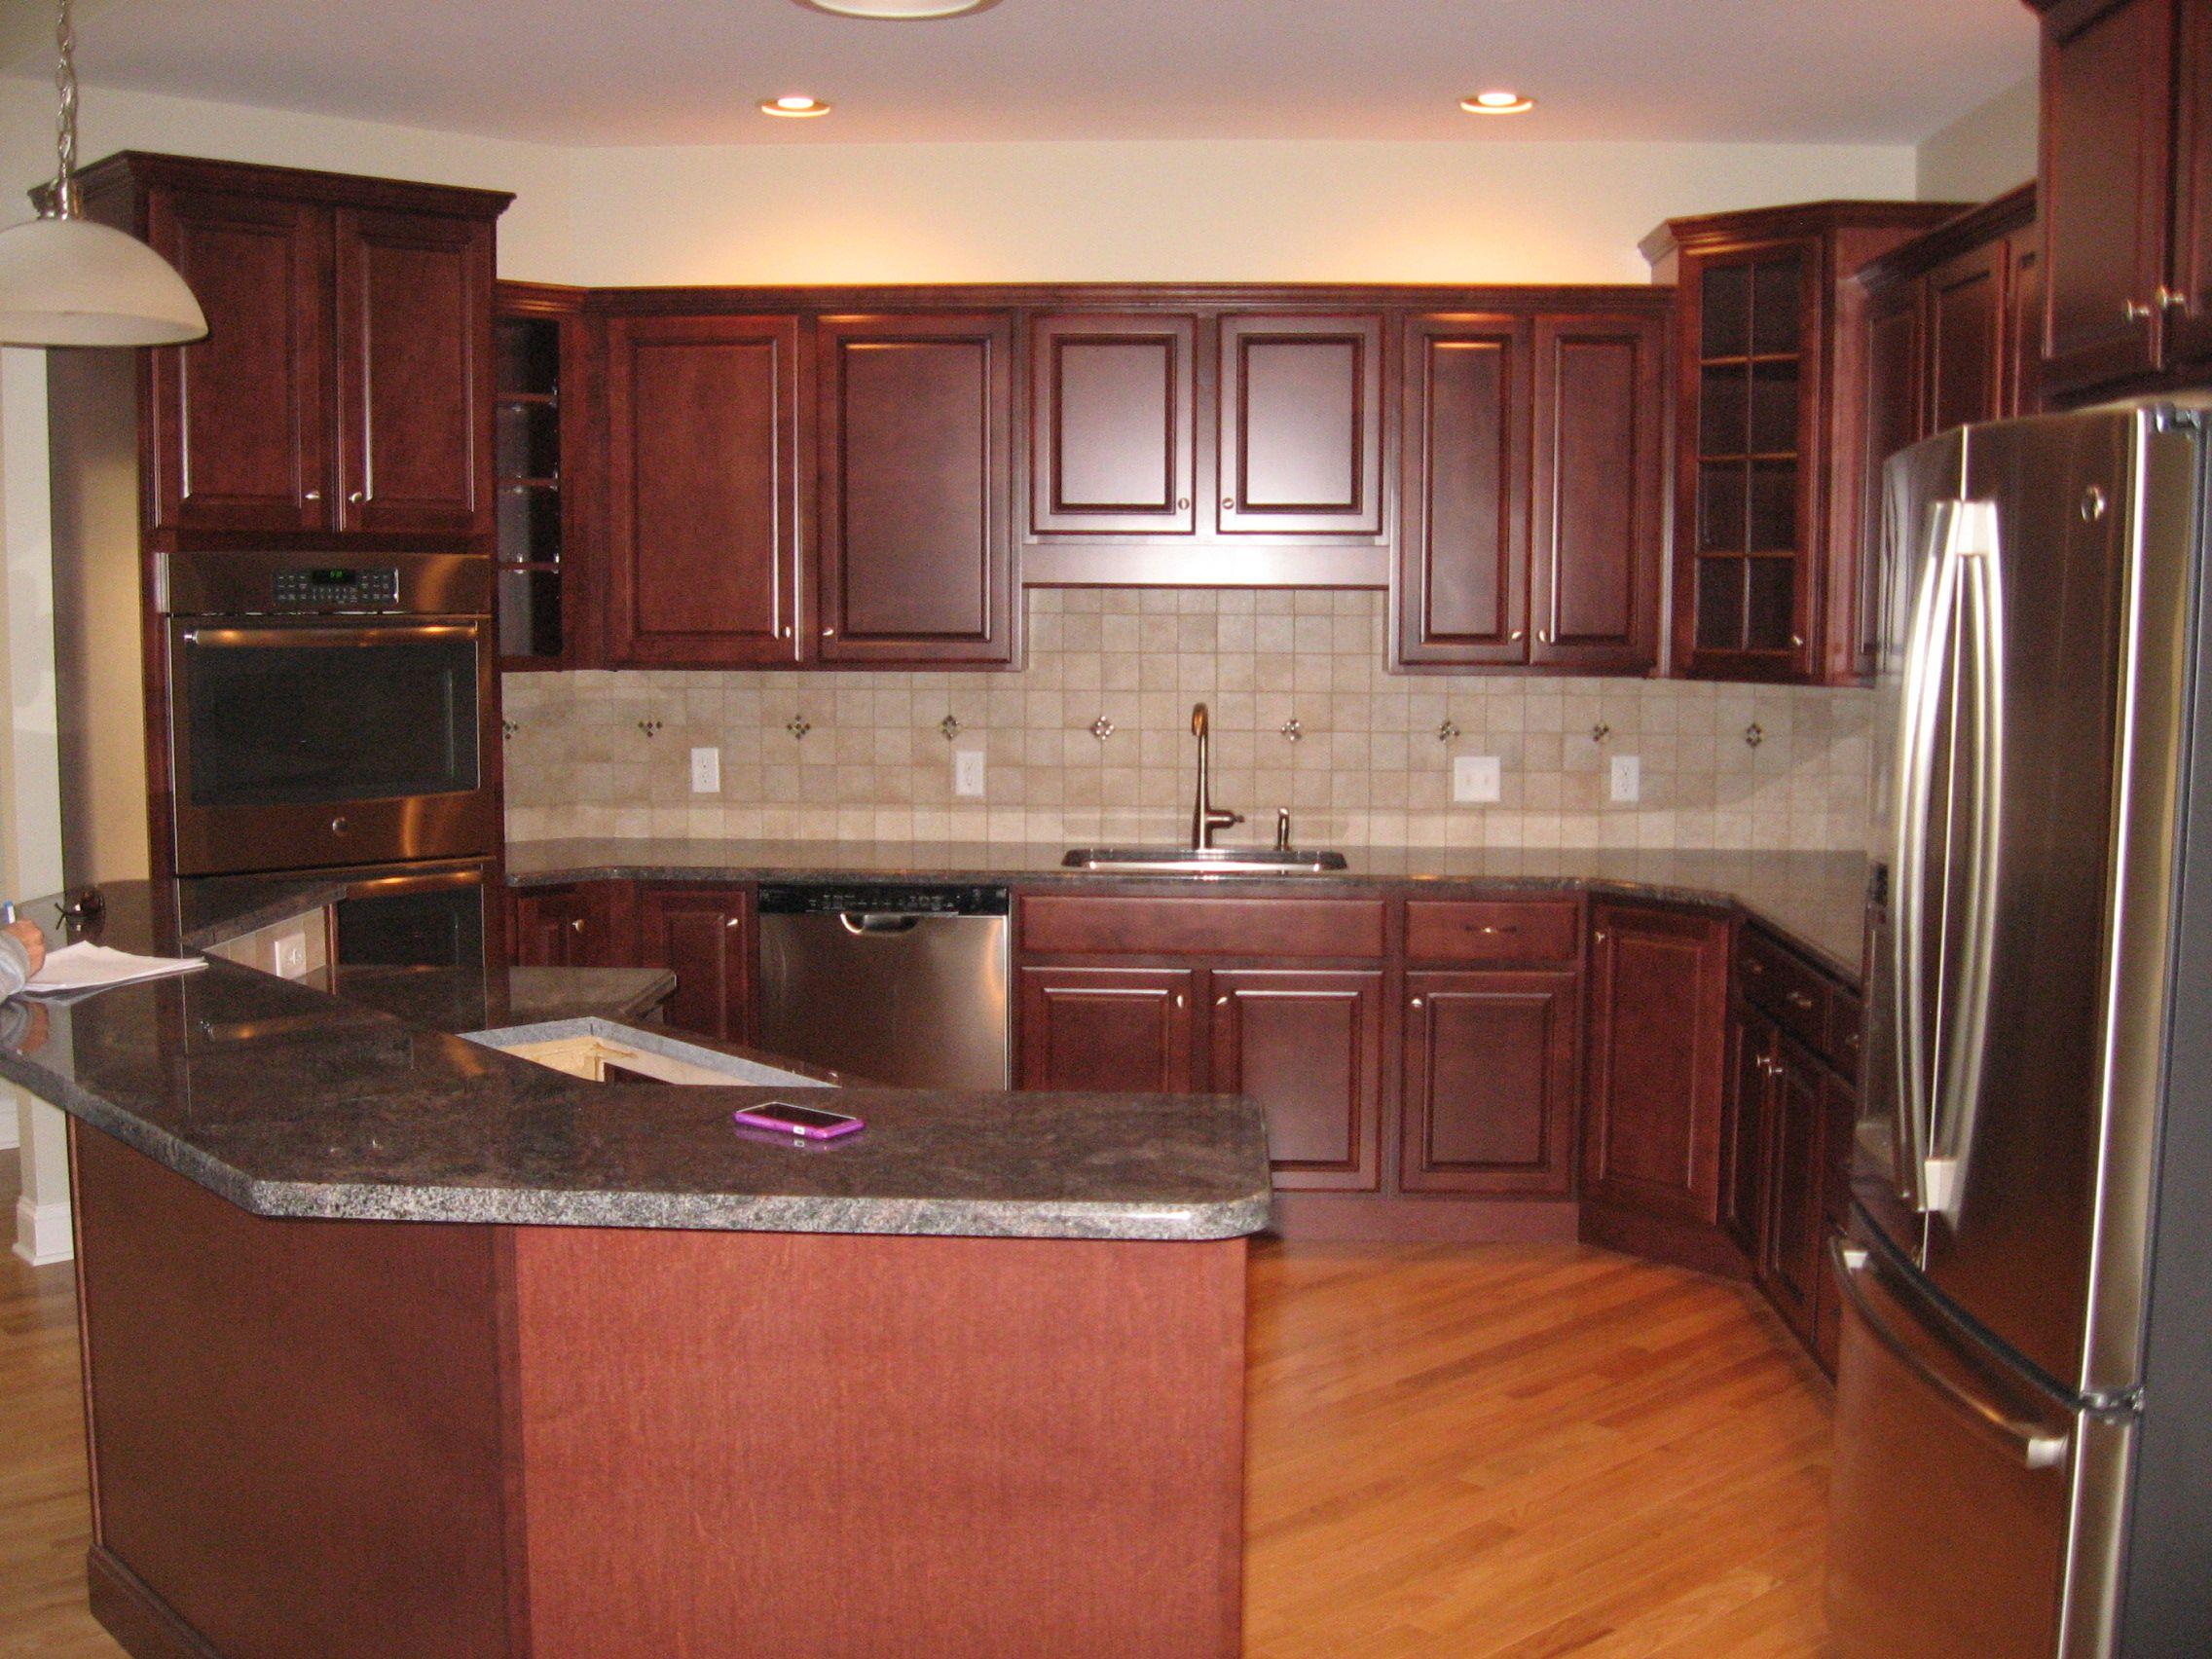 Customcabinets Mechanicsburgpennsylvania Https Www Kountrykraft Com Custom Kitchen Cabinets Painting Cabinets Custom Cabinetry